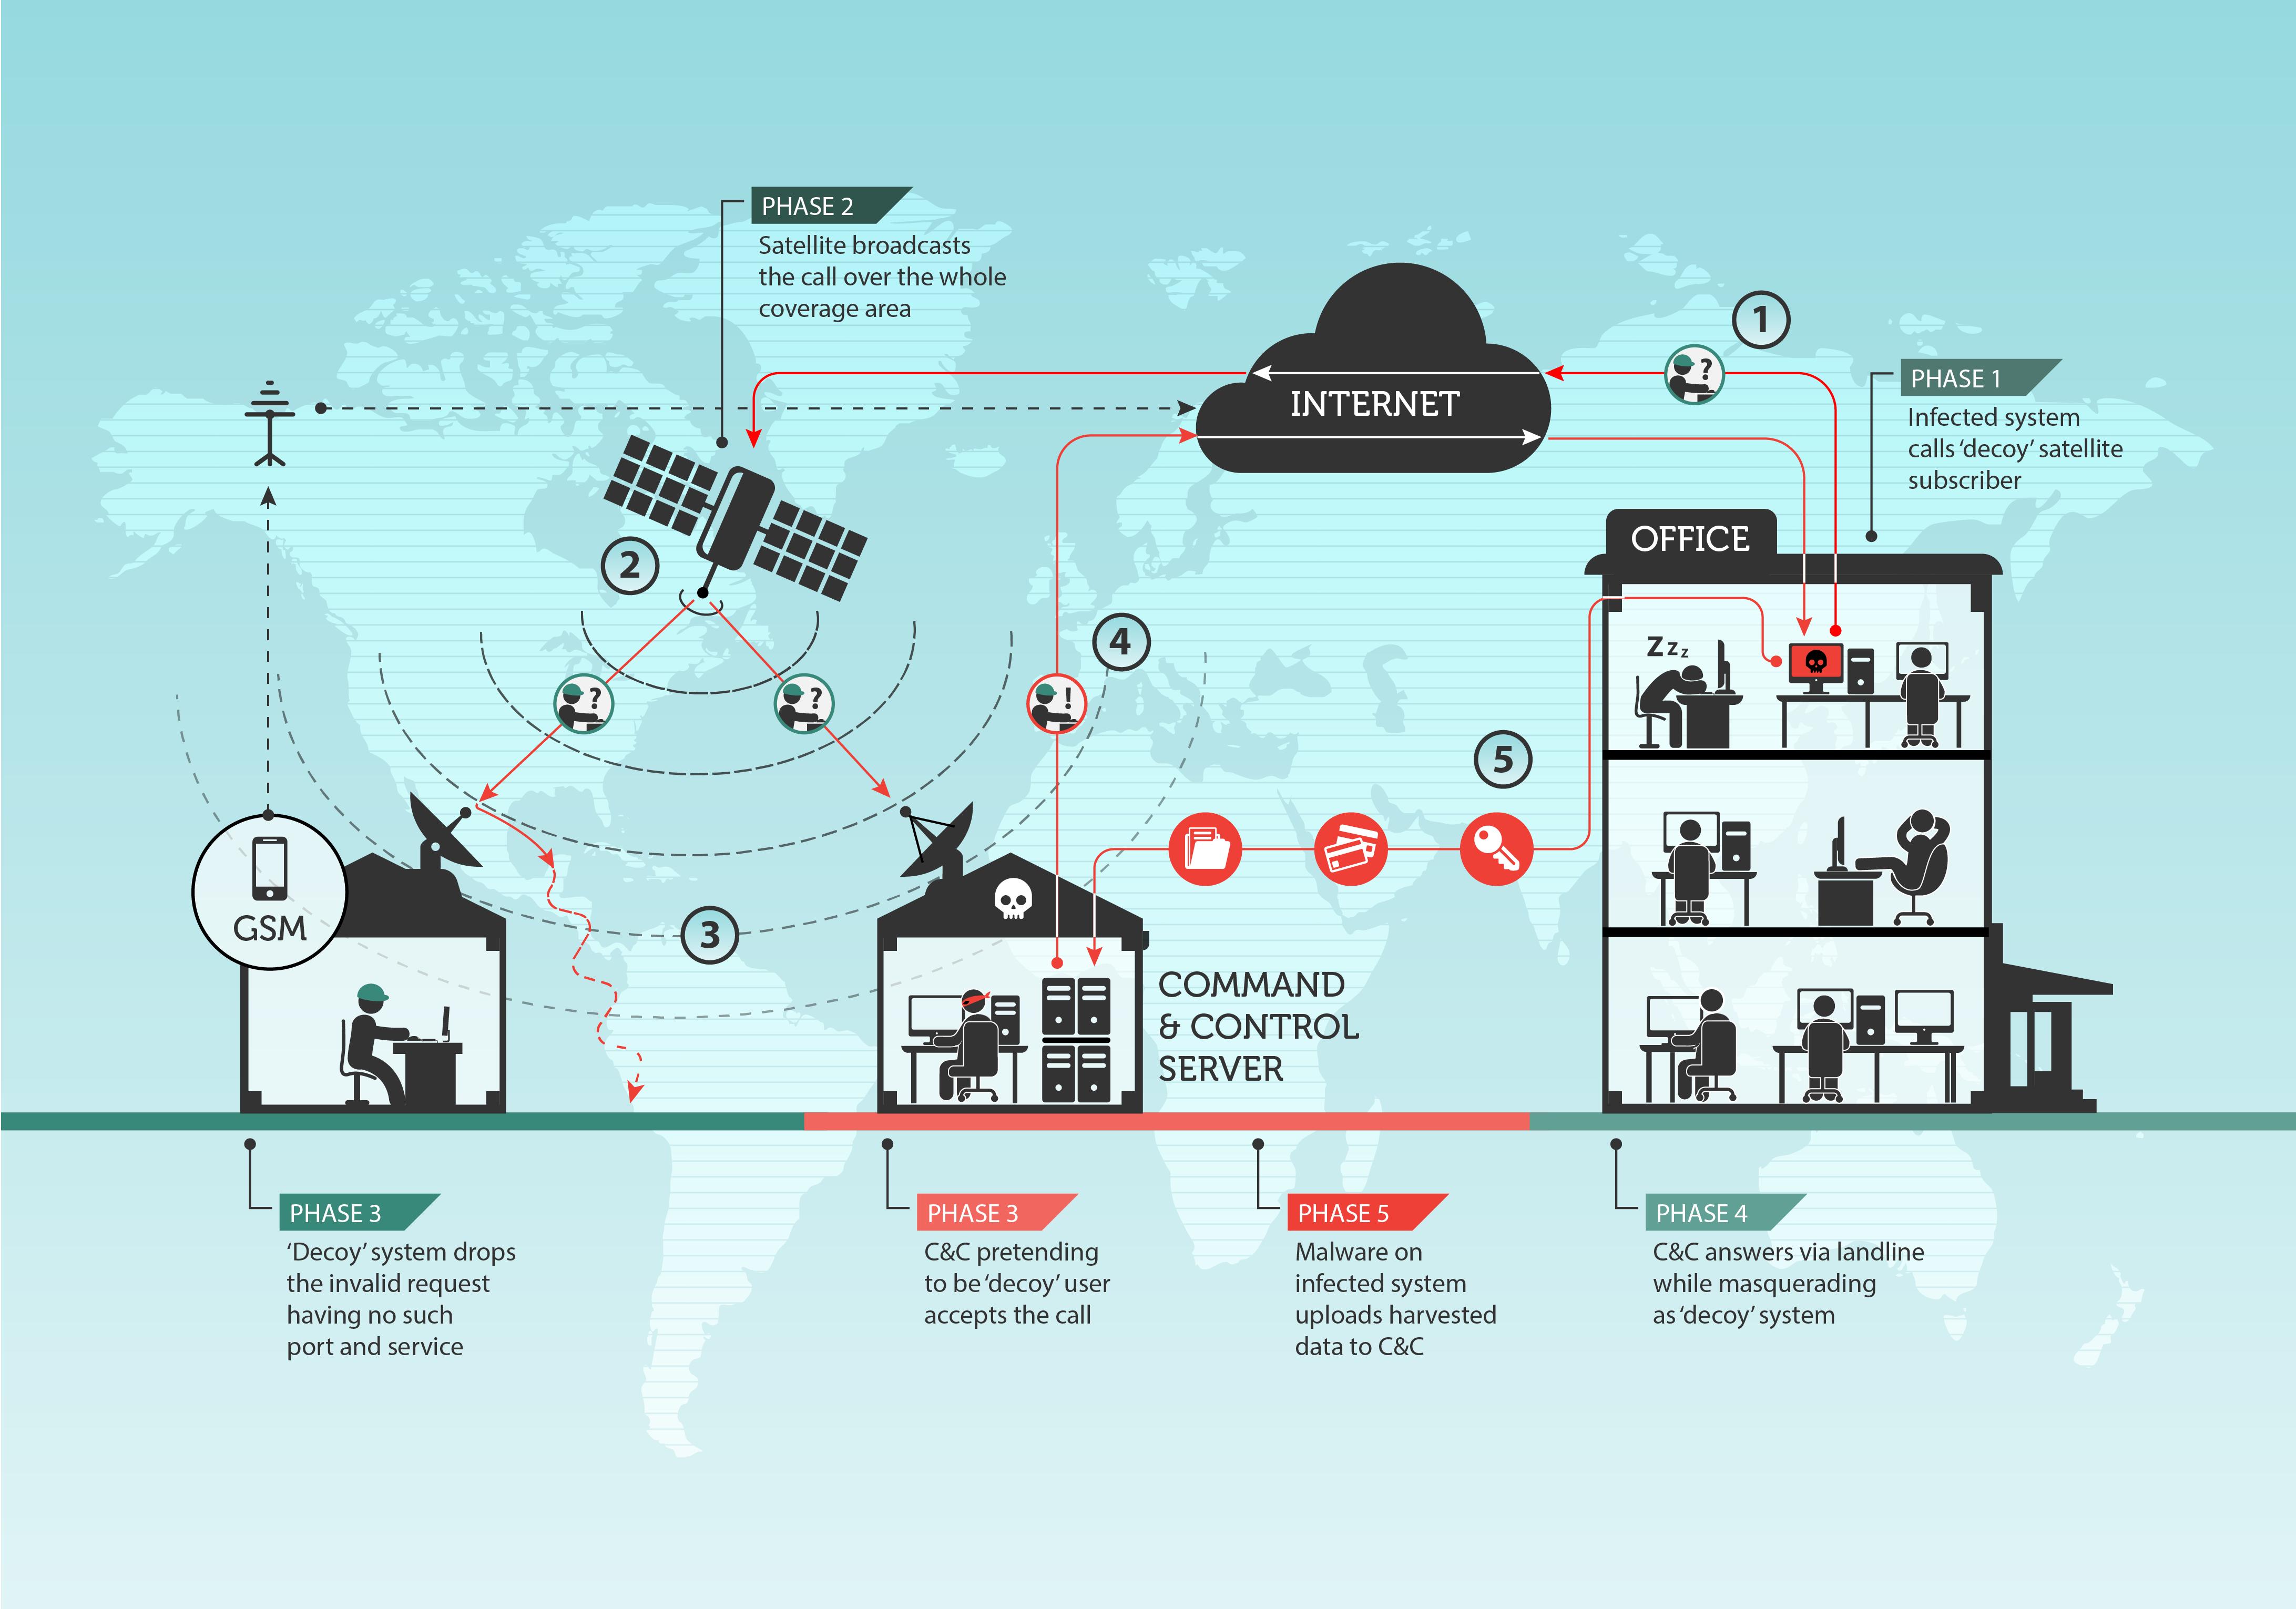 Turla APT Group Abusing Satellite Internet Links | Threatpost